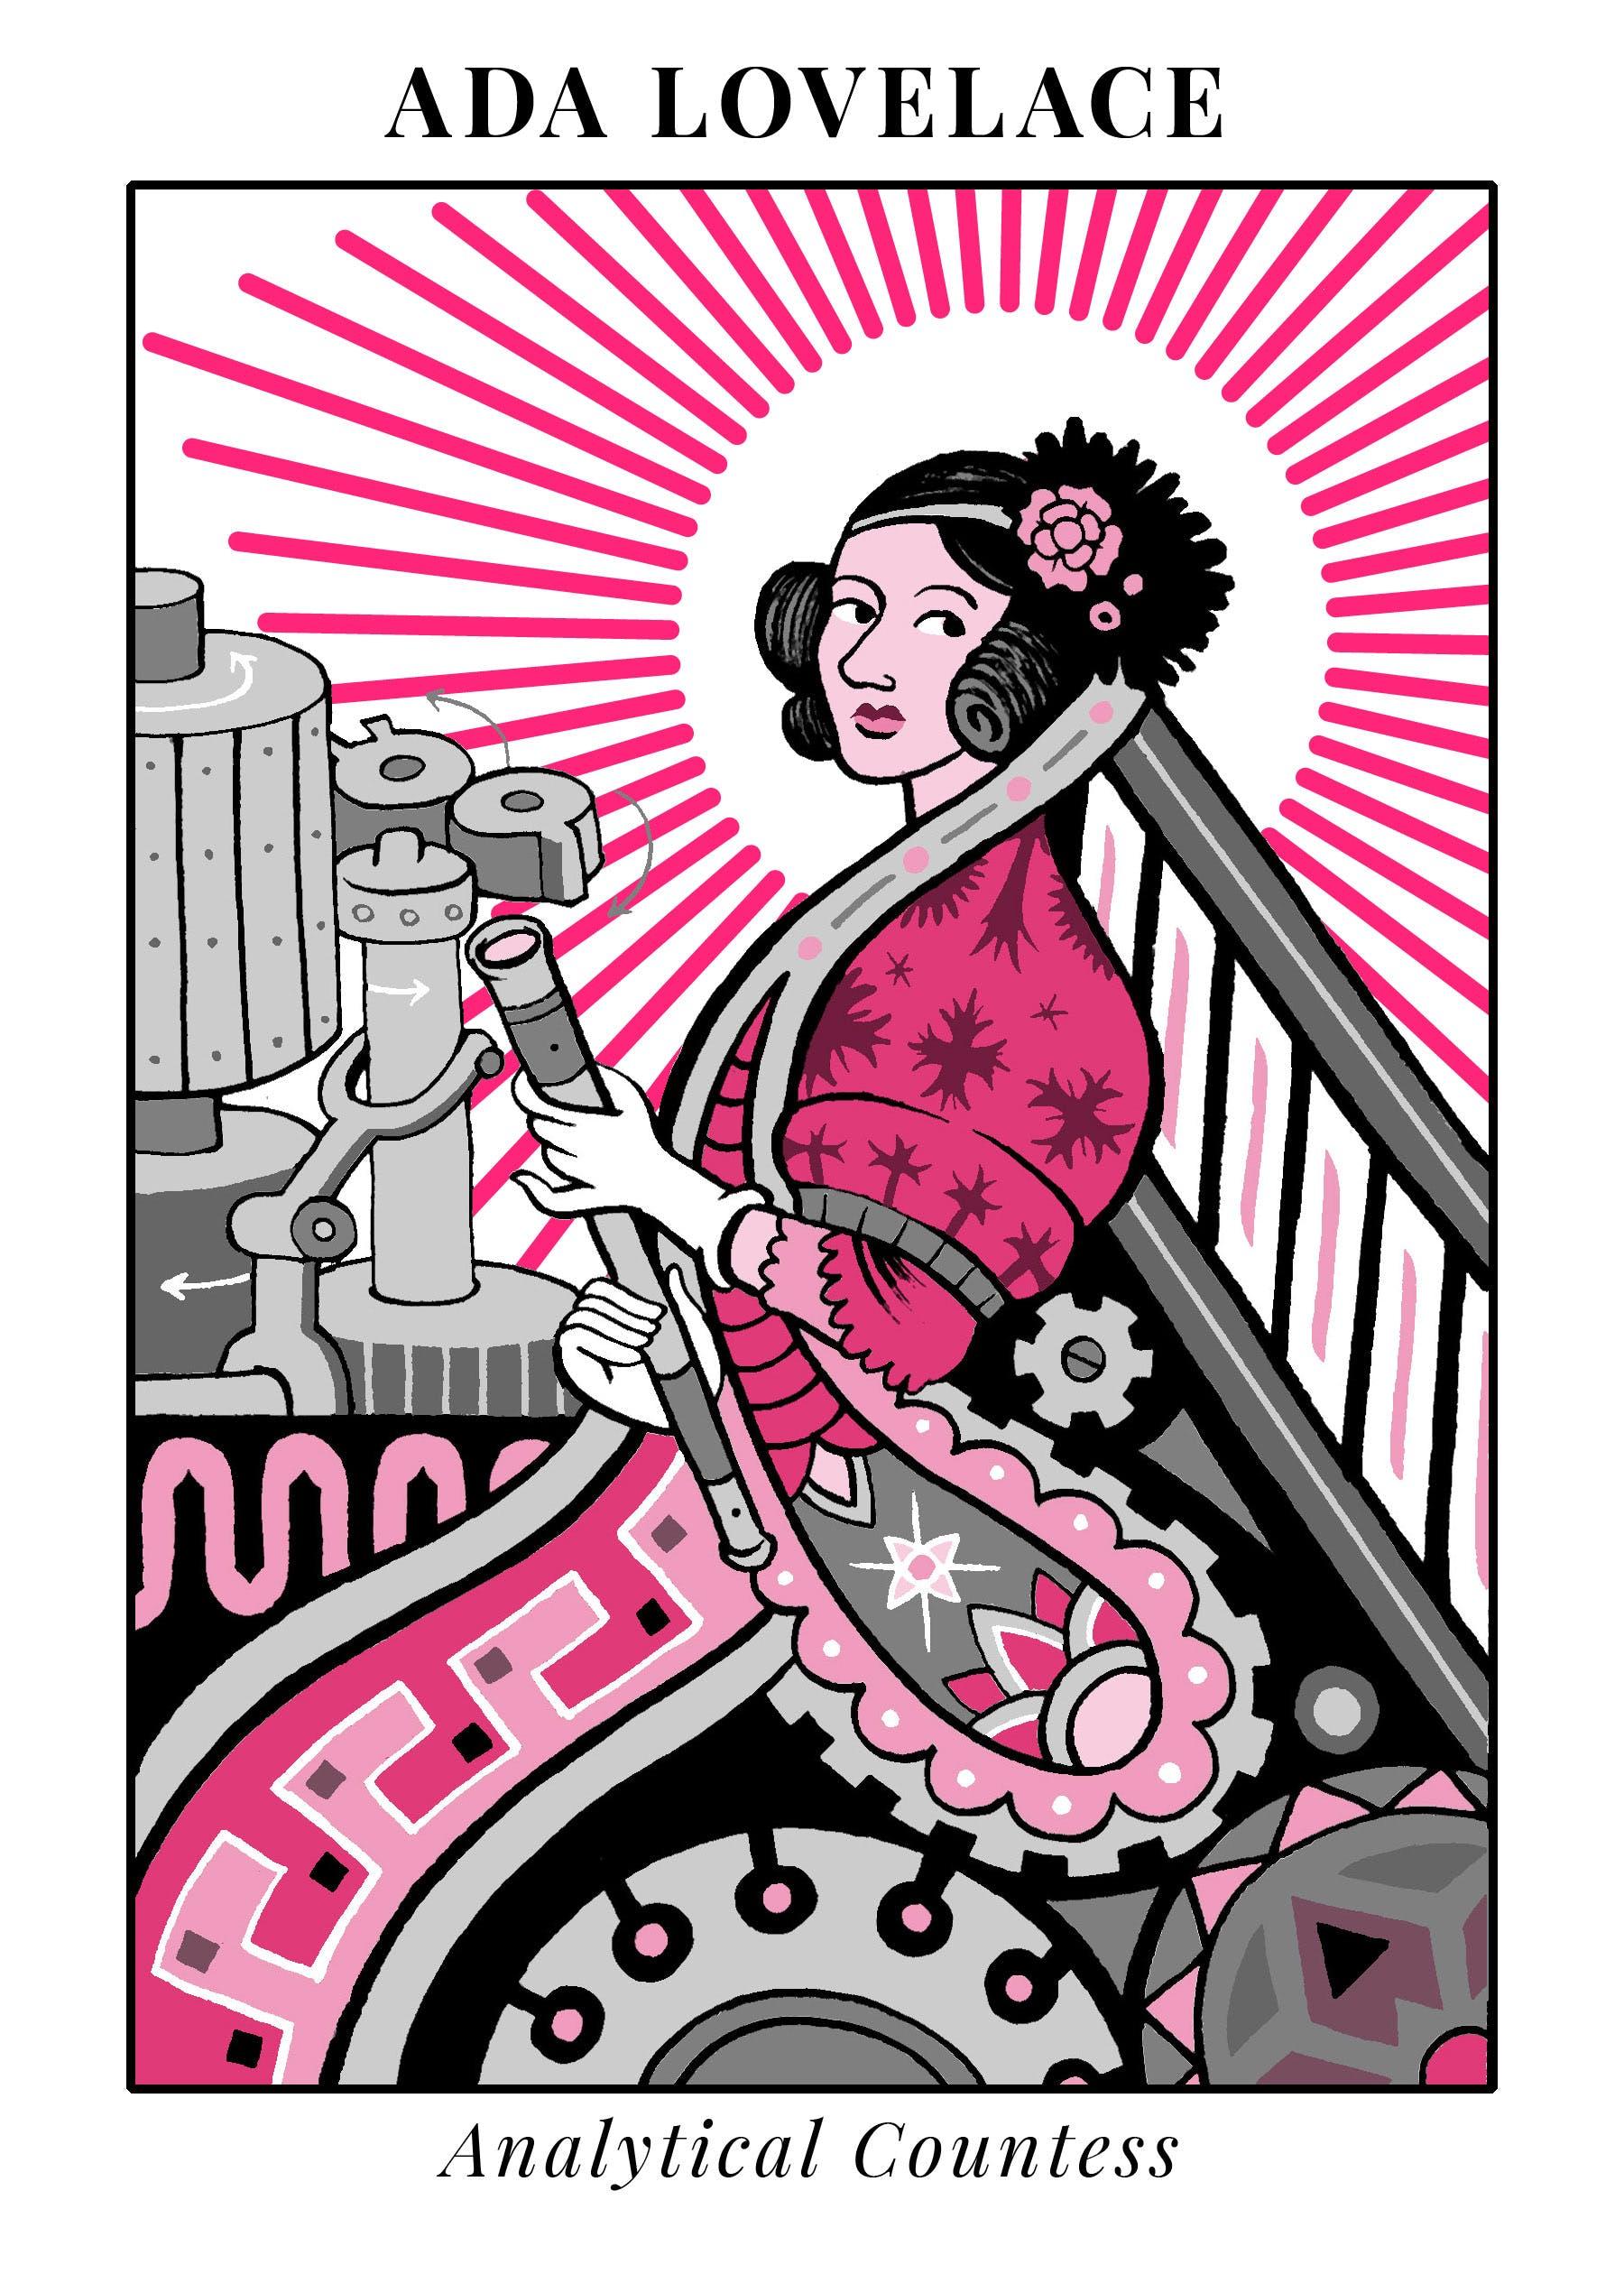 illustration of Ada Lovelace